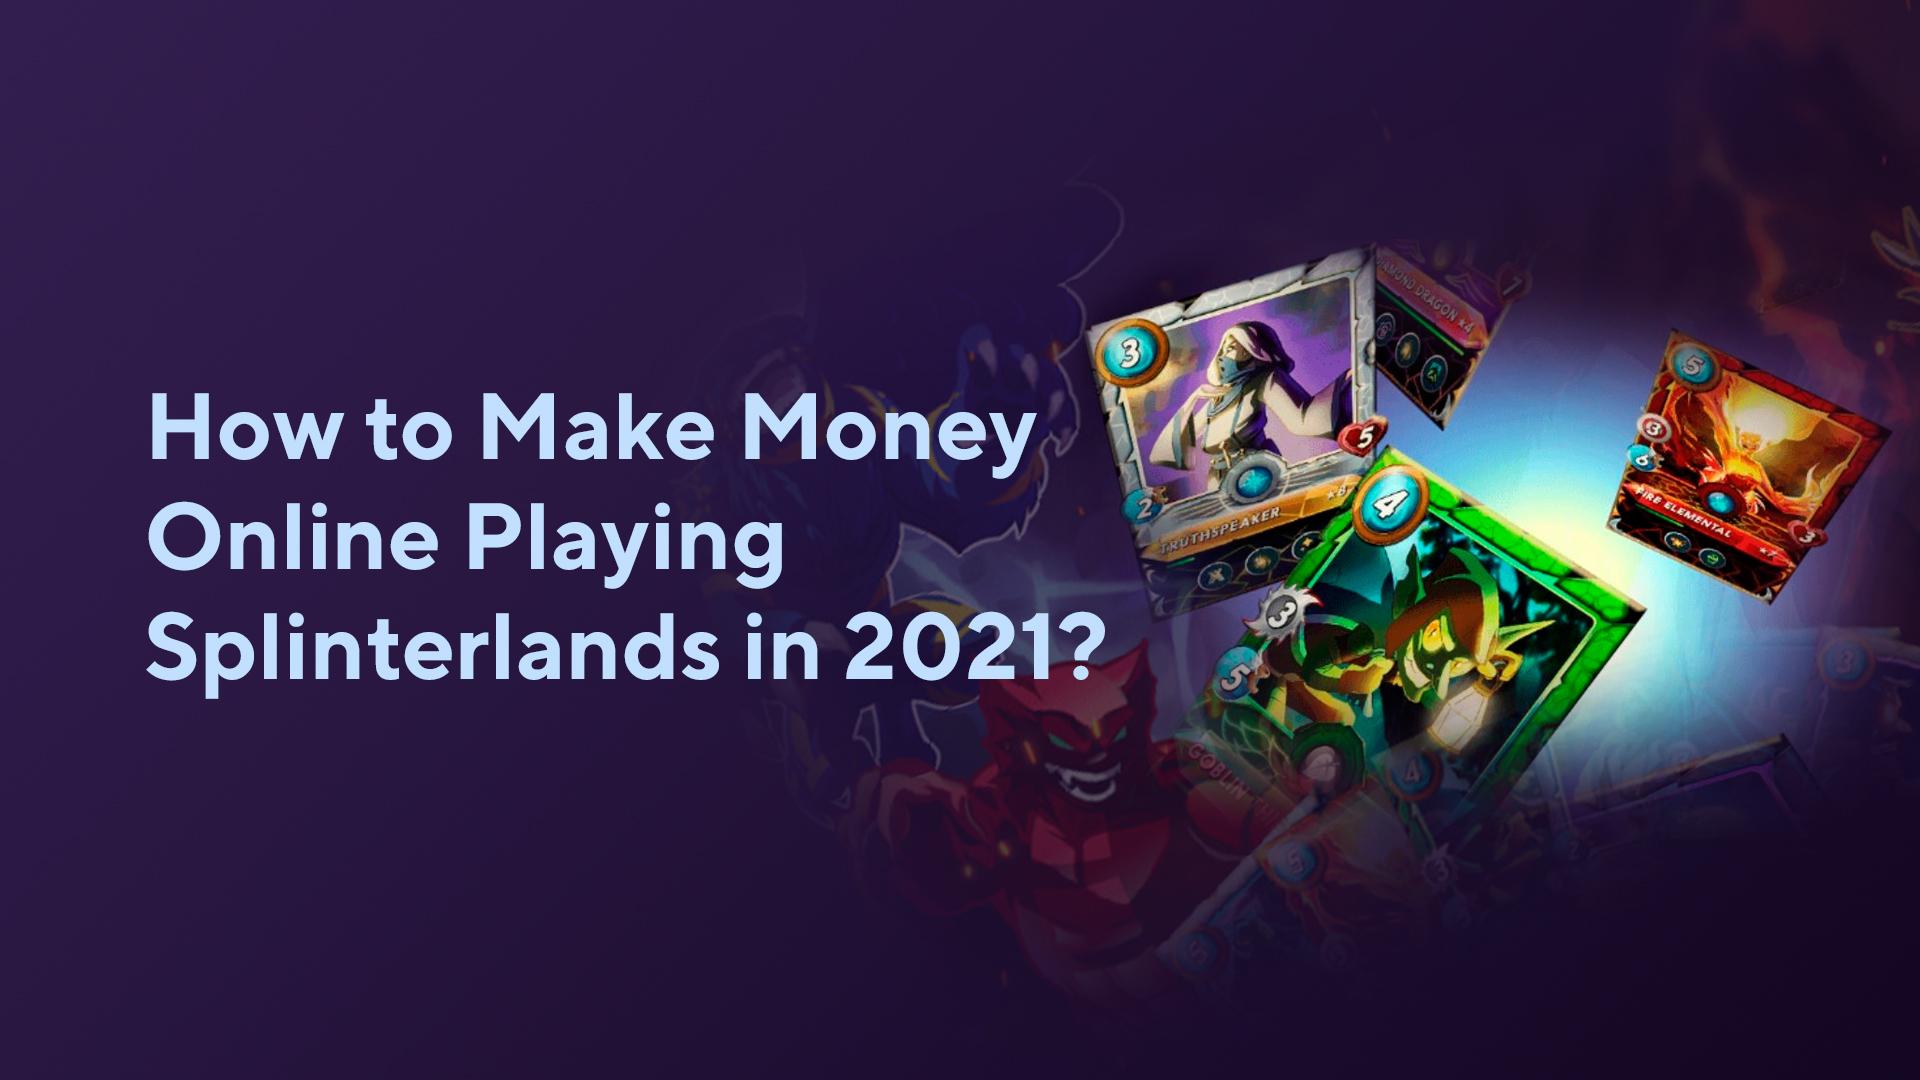 How to Make Money Online Playing Splinterlands in 2021?